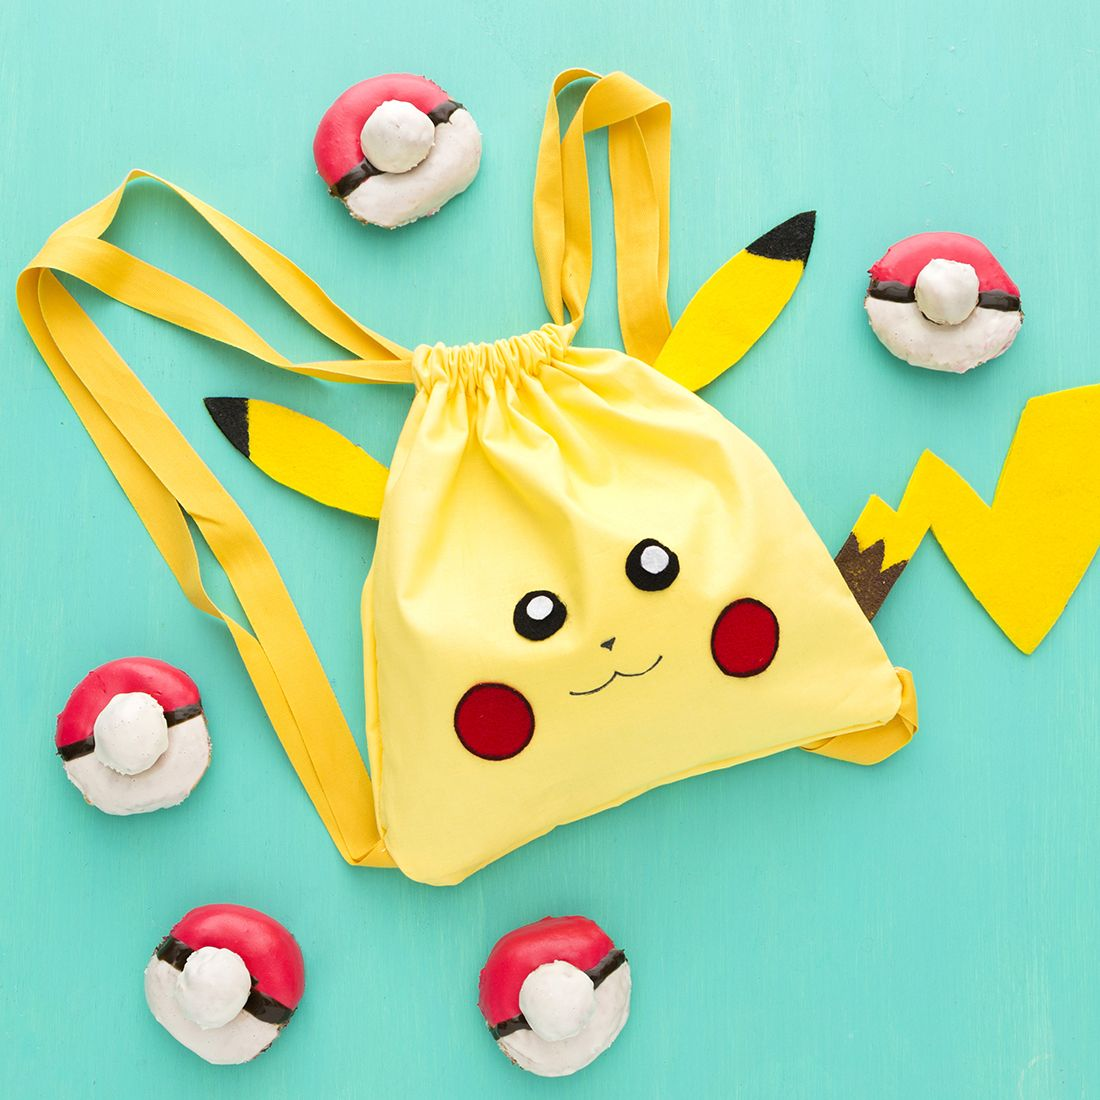 2 Easy DIYS to Make Before Your Next Pokémon Go Adventure via Brit + Co